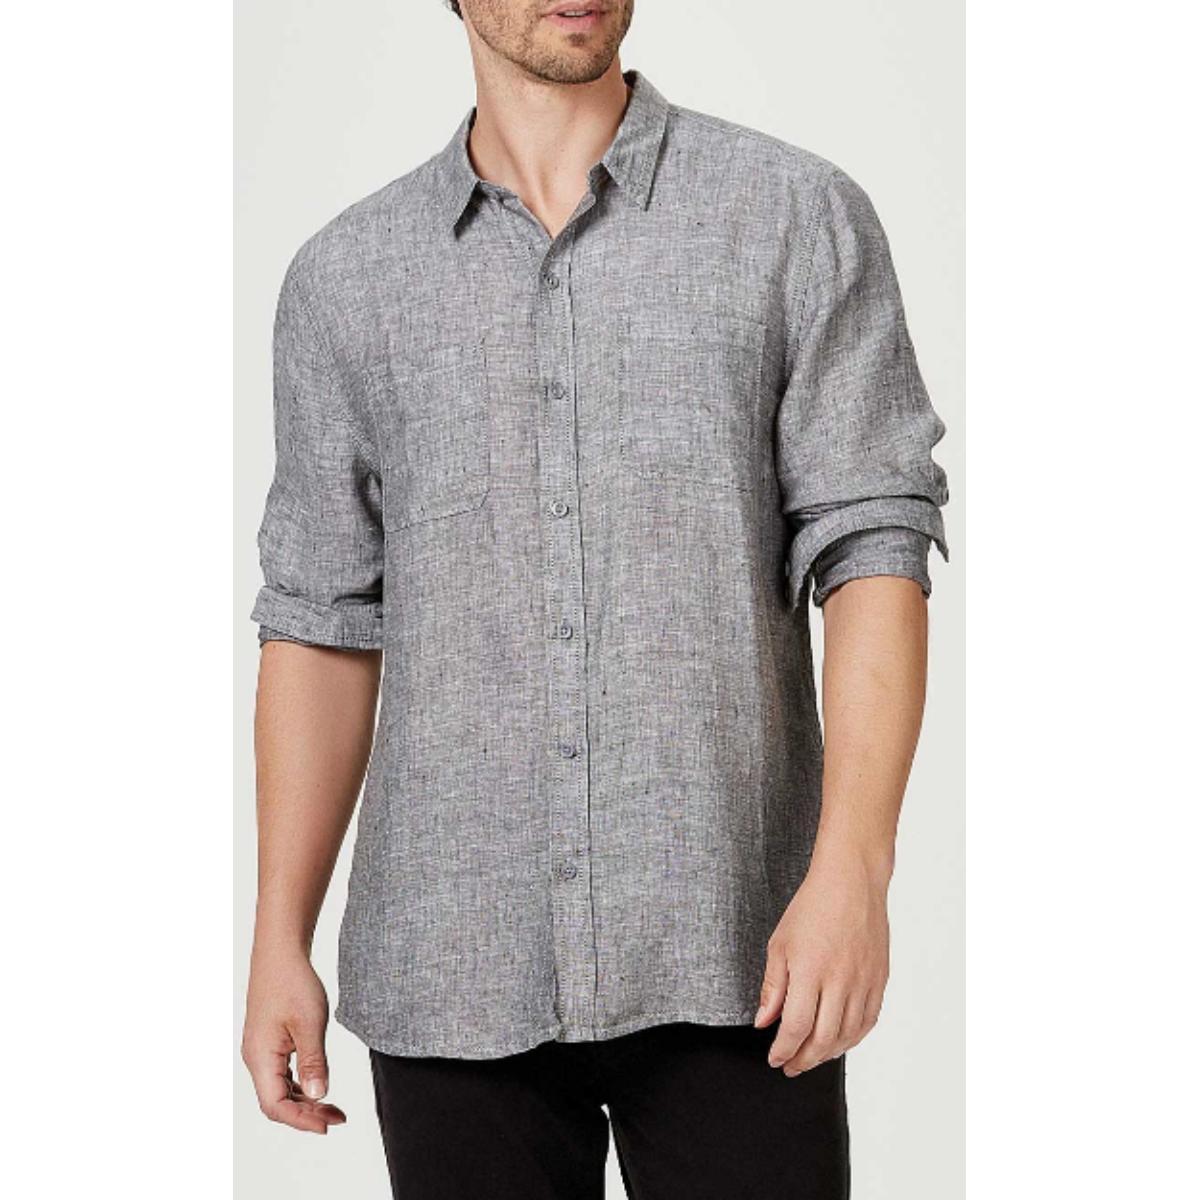 Camisa Masculina Hering Ktv7 1gsi Cinza